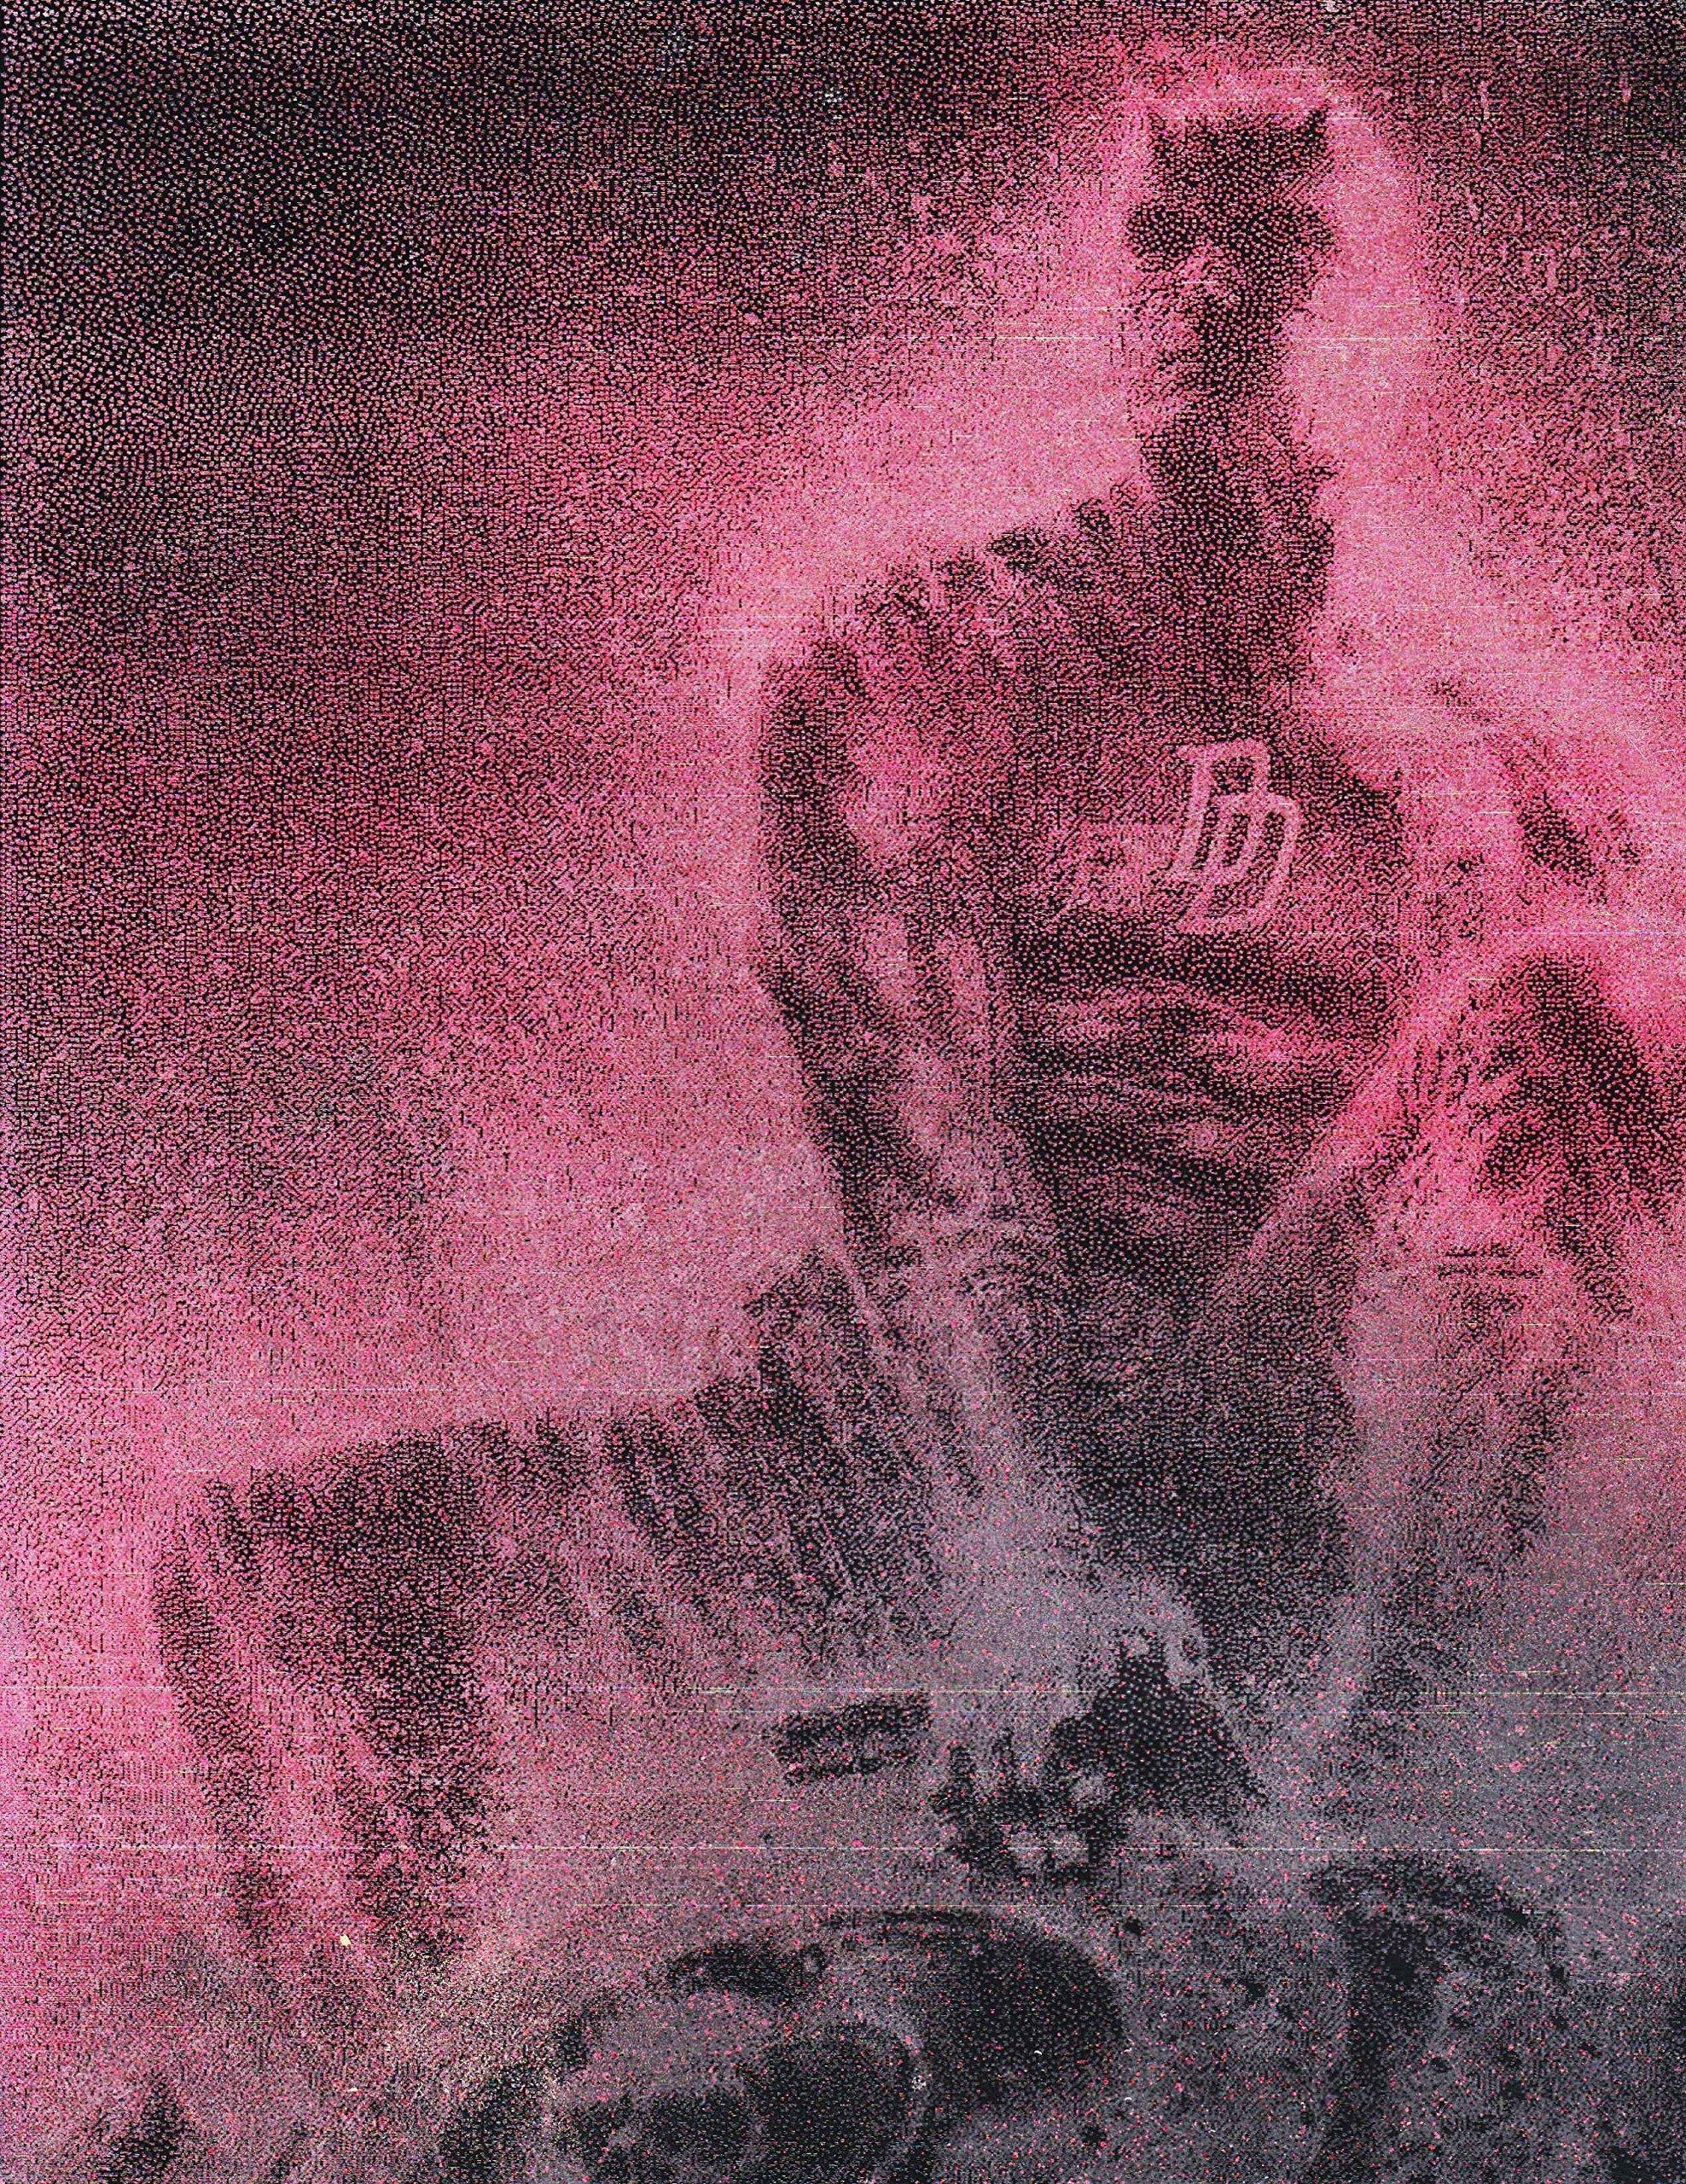 Daredevil Gargoyle Matt Murdock Metal Poster Spray Paint Art by Art of Steel